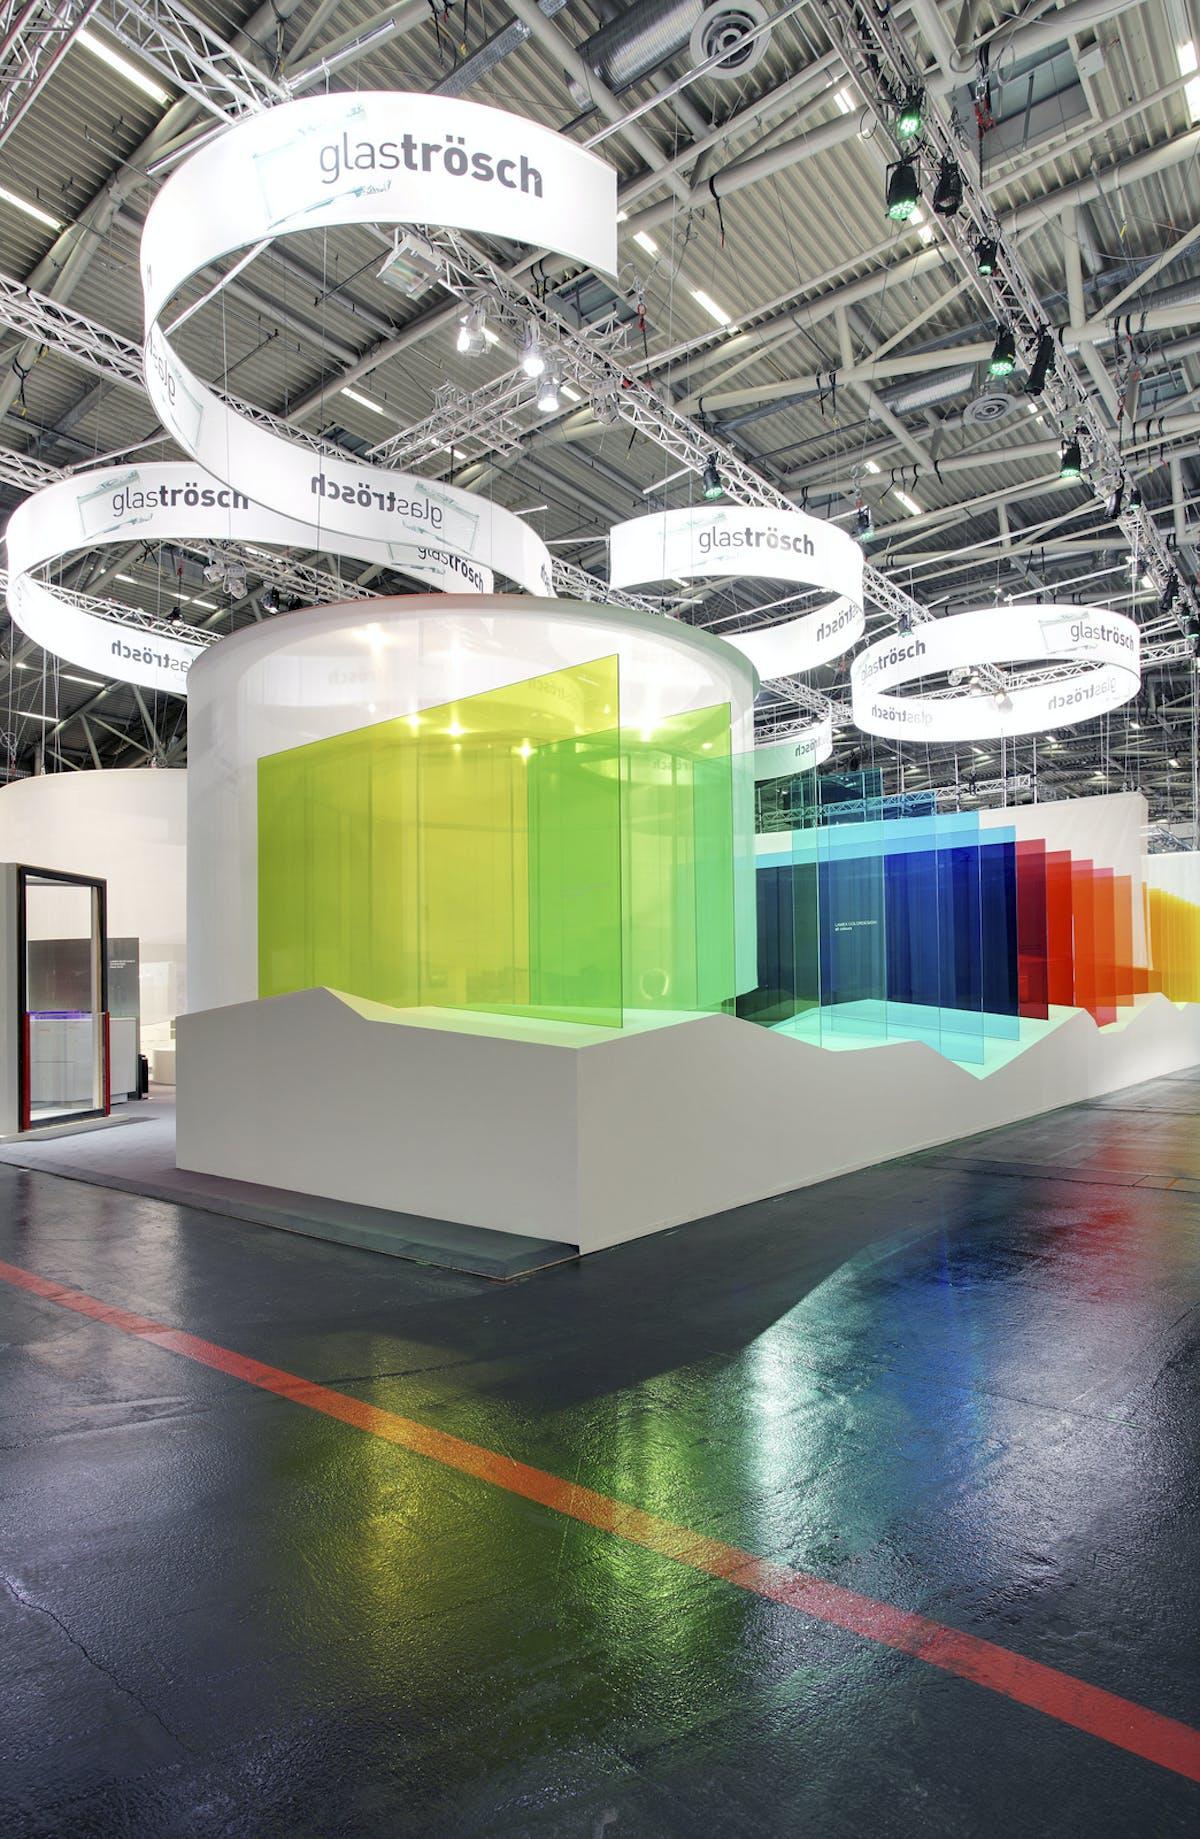 glass tr sch bau 2013 softlab archinect. Black Bedroom Furniture Sets. Home Design Ideas